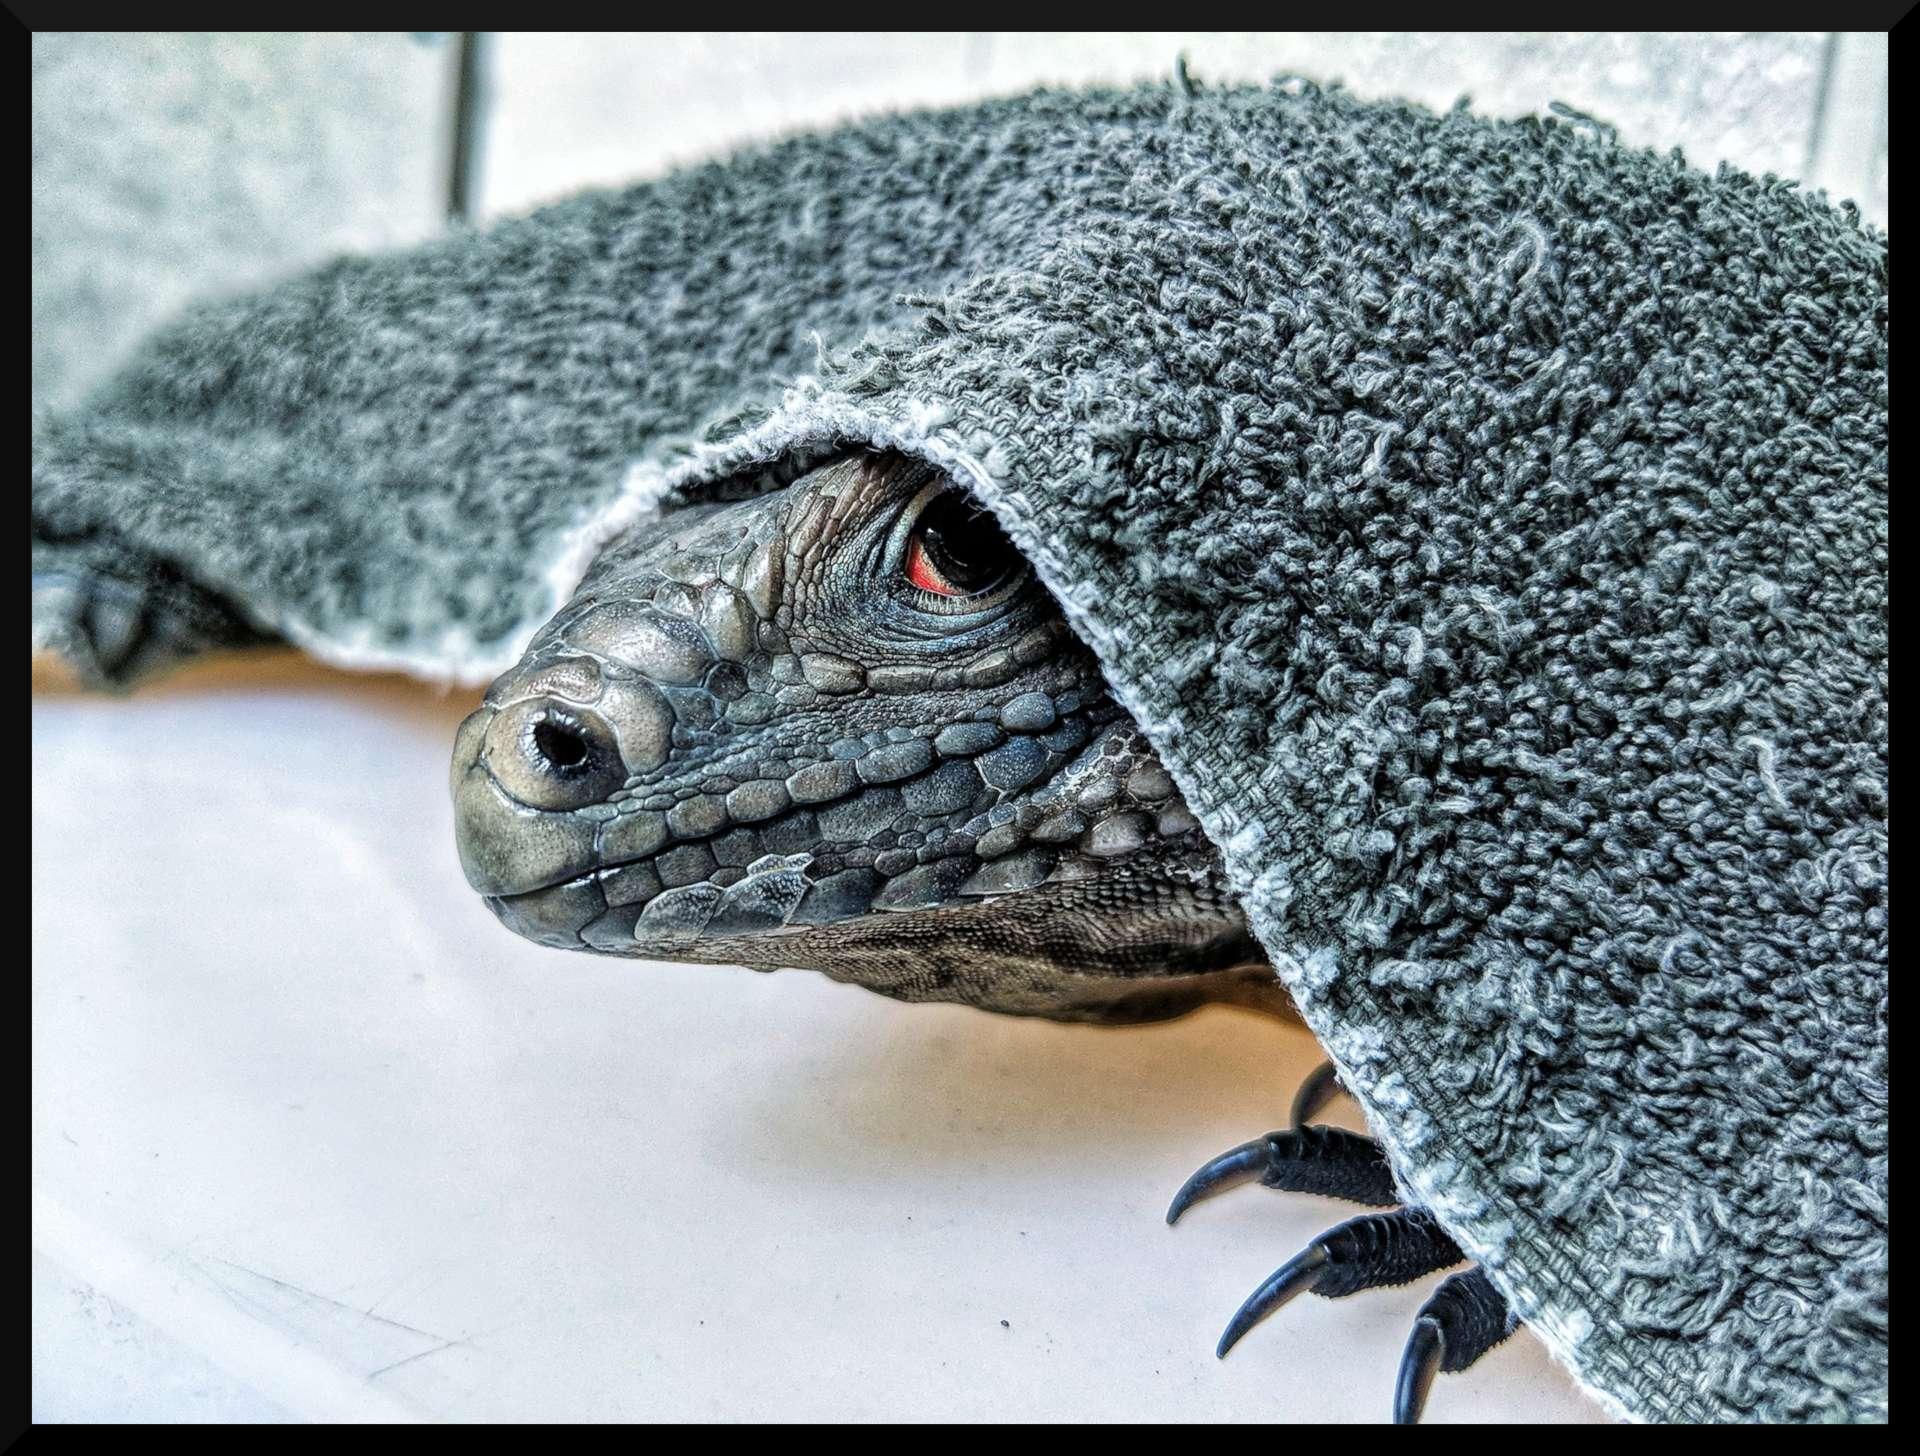 lewisi hybrid iguana face sticking out from under dark blue towel, white flooring